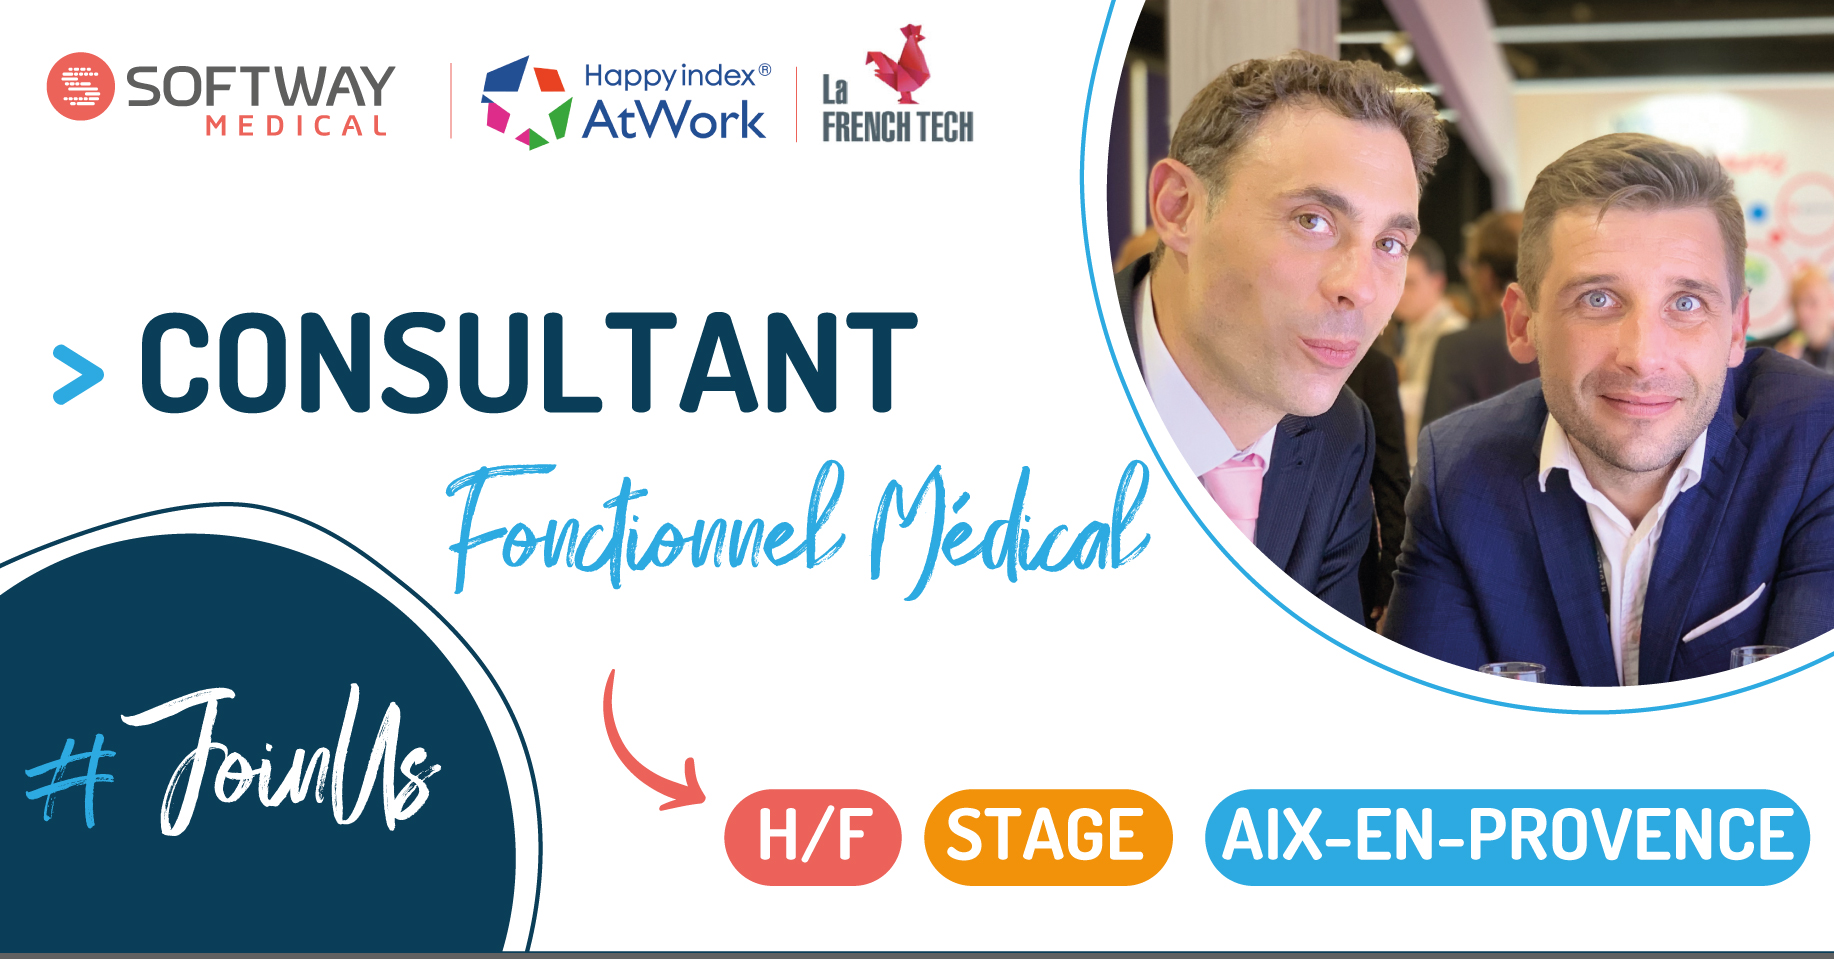 STAGIAIRE CONSULTANT FONCTIONNEL MEDICAL – H/F – Aix-En-Provence